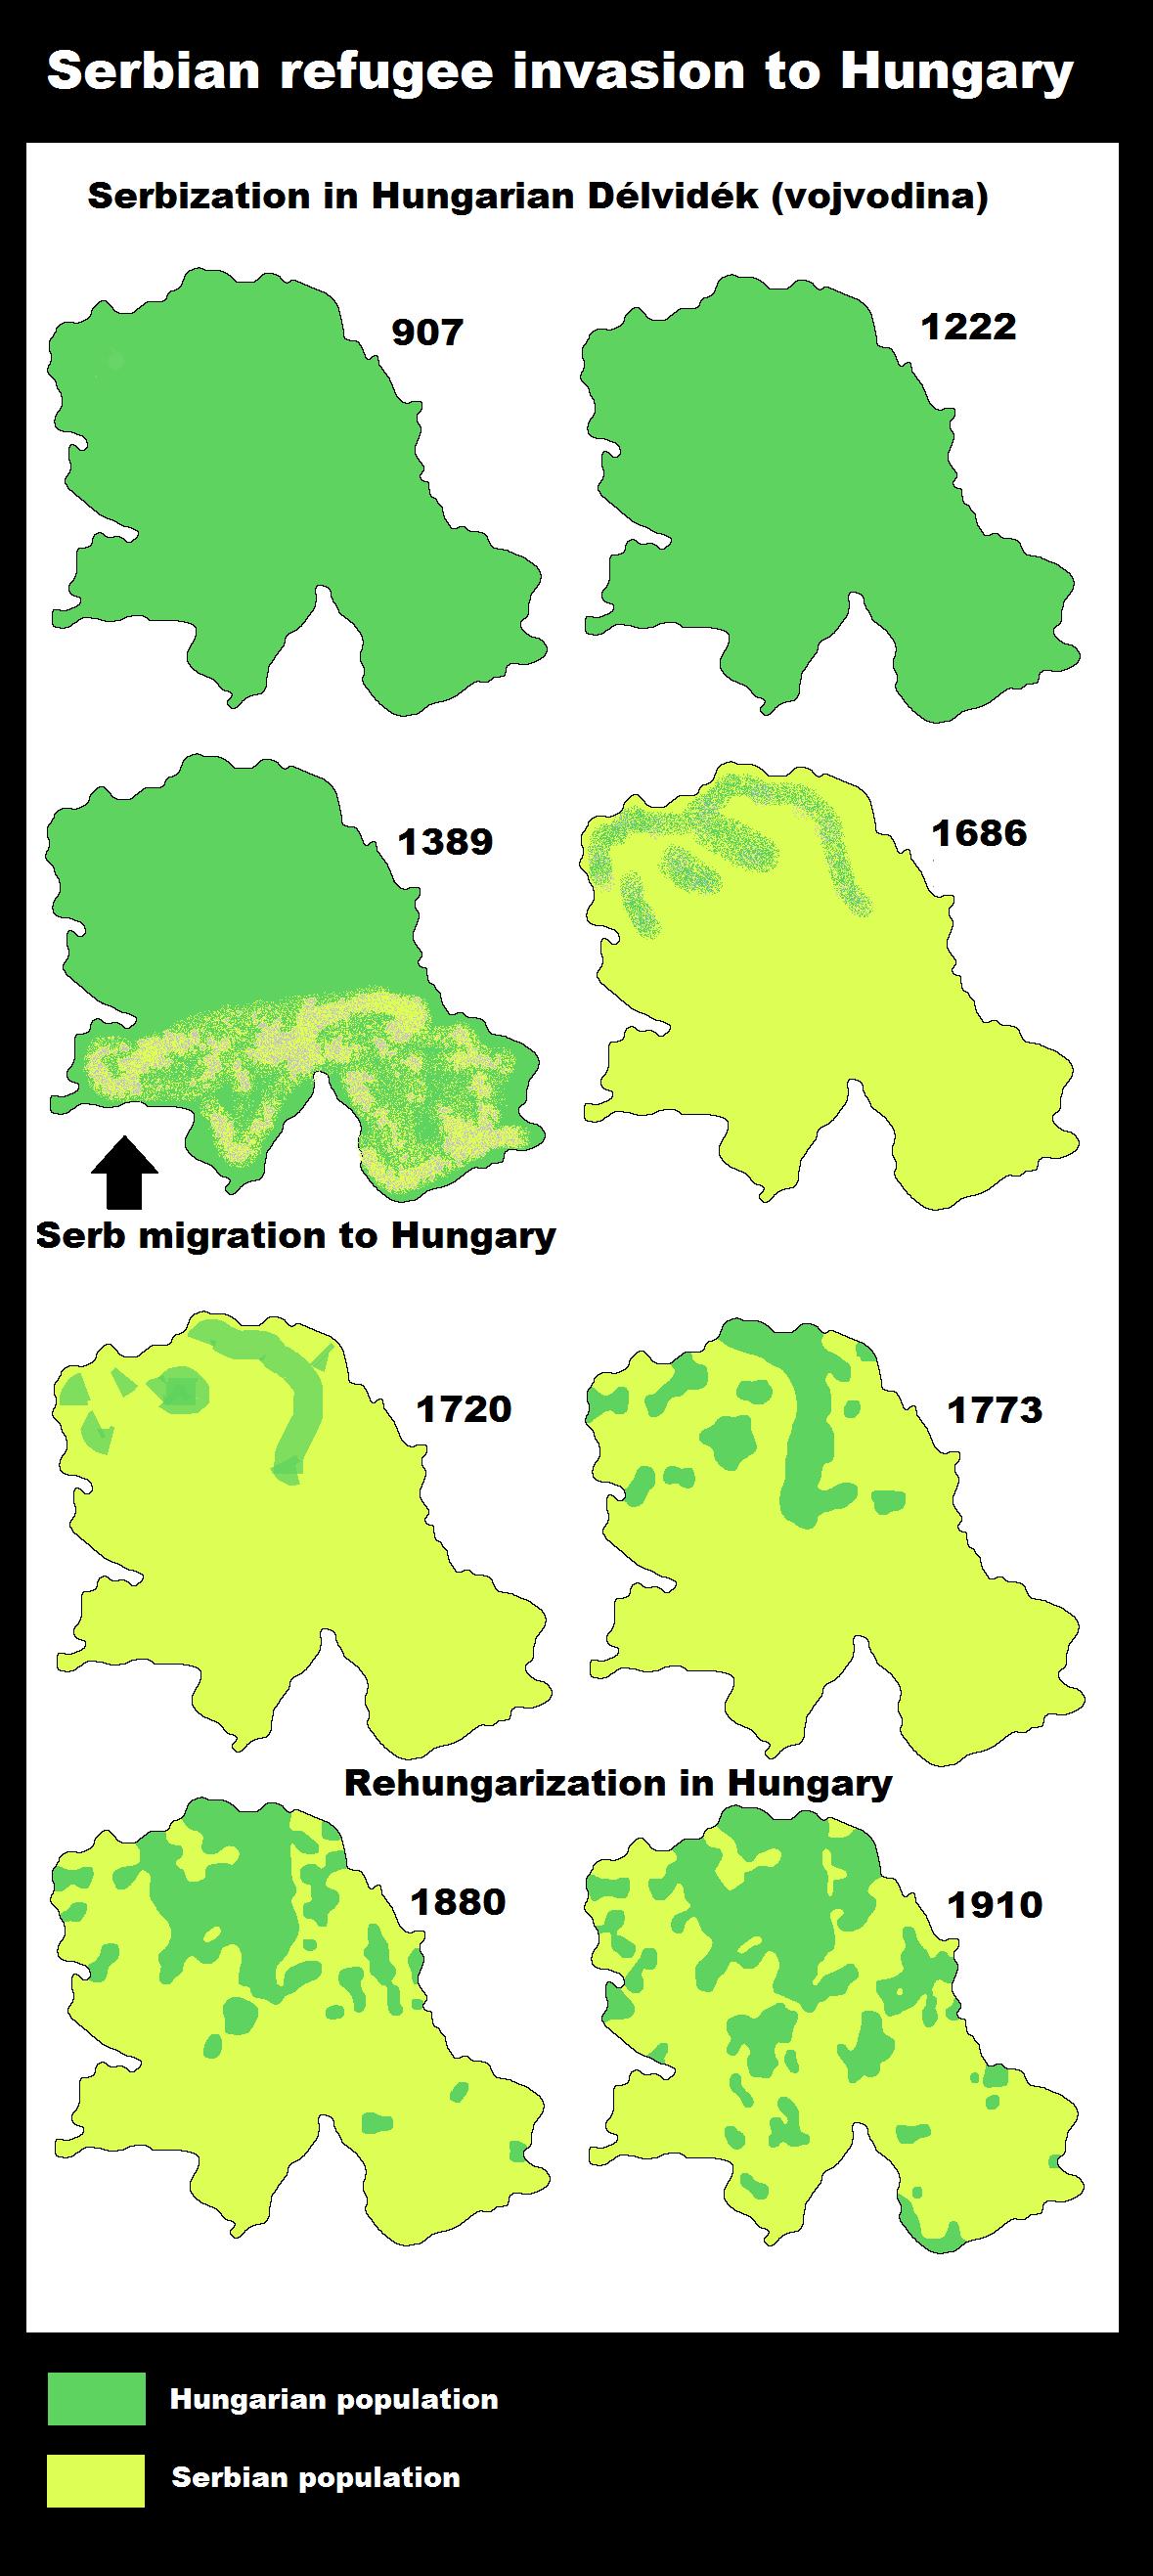 20140524091528_magyarization_of_vojvodina_1720-1910.png